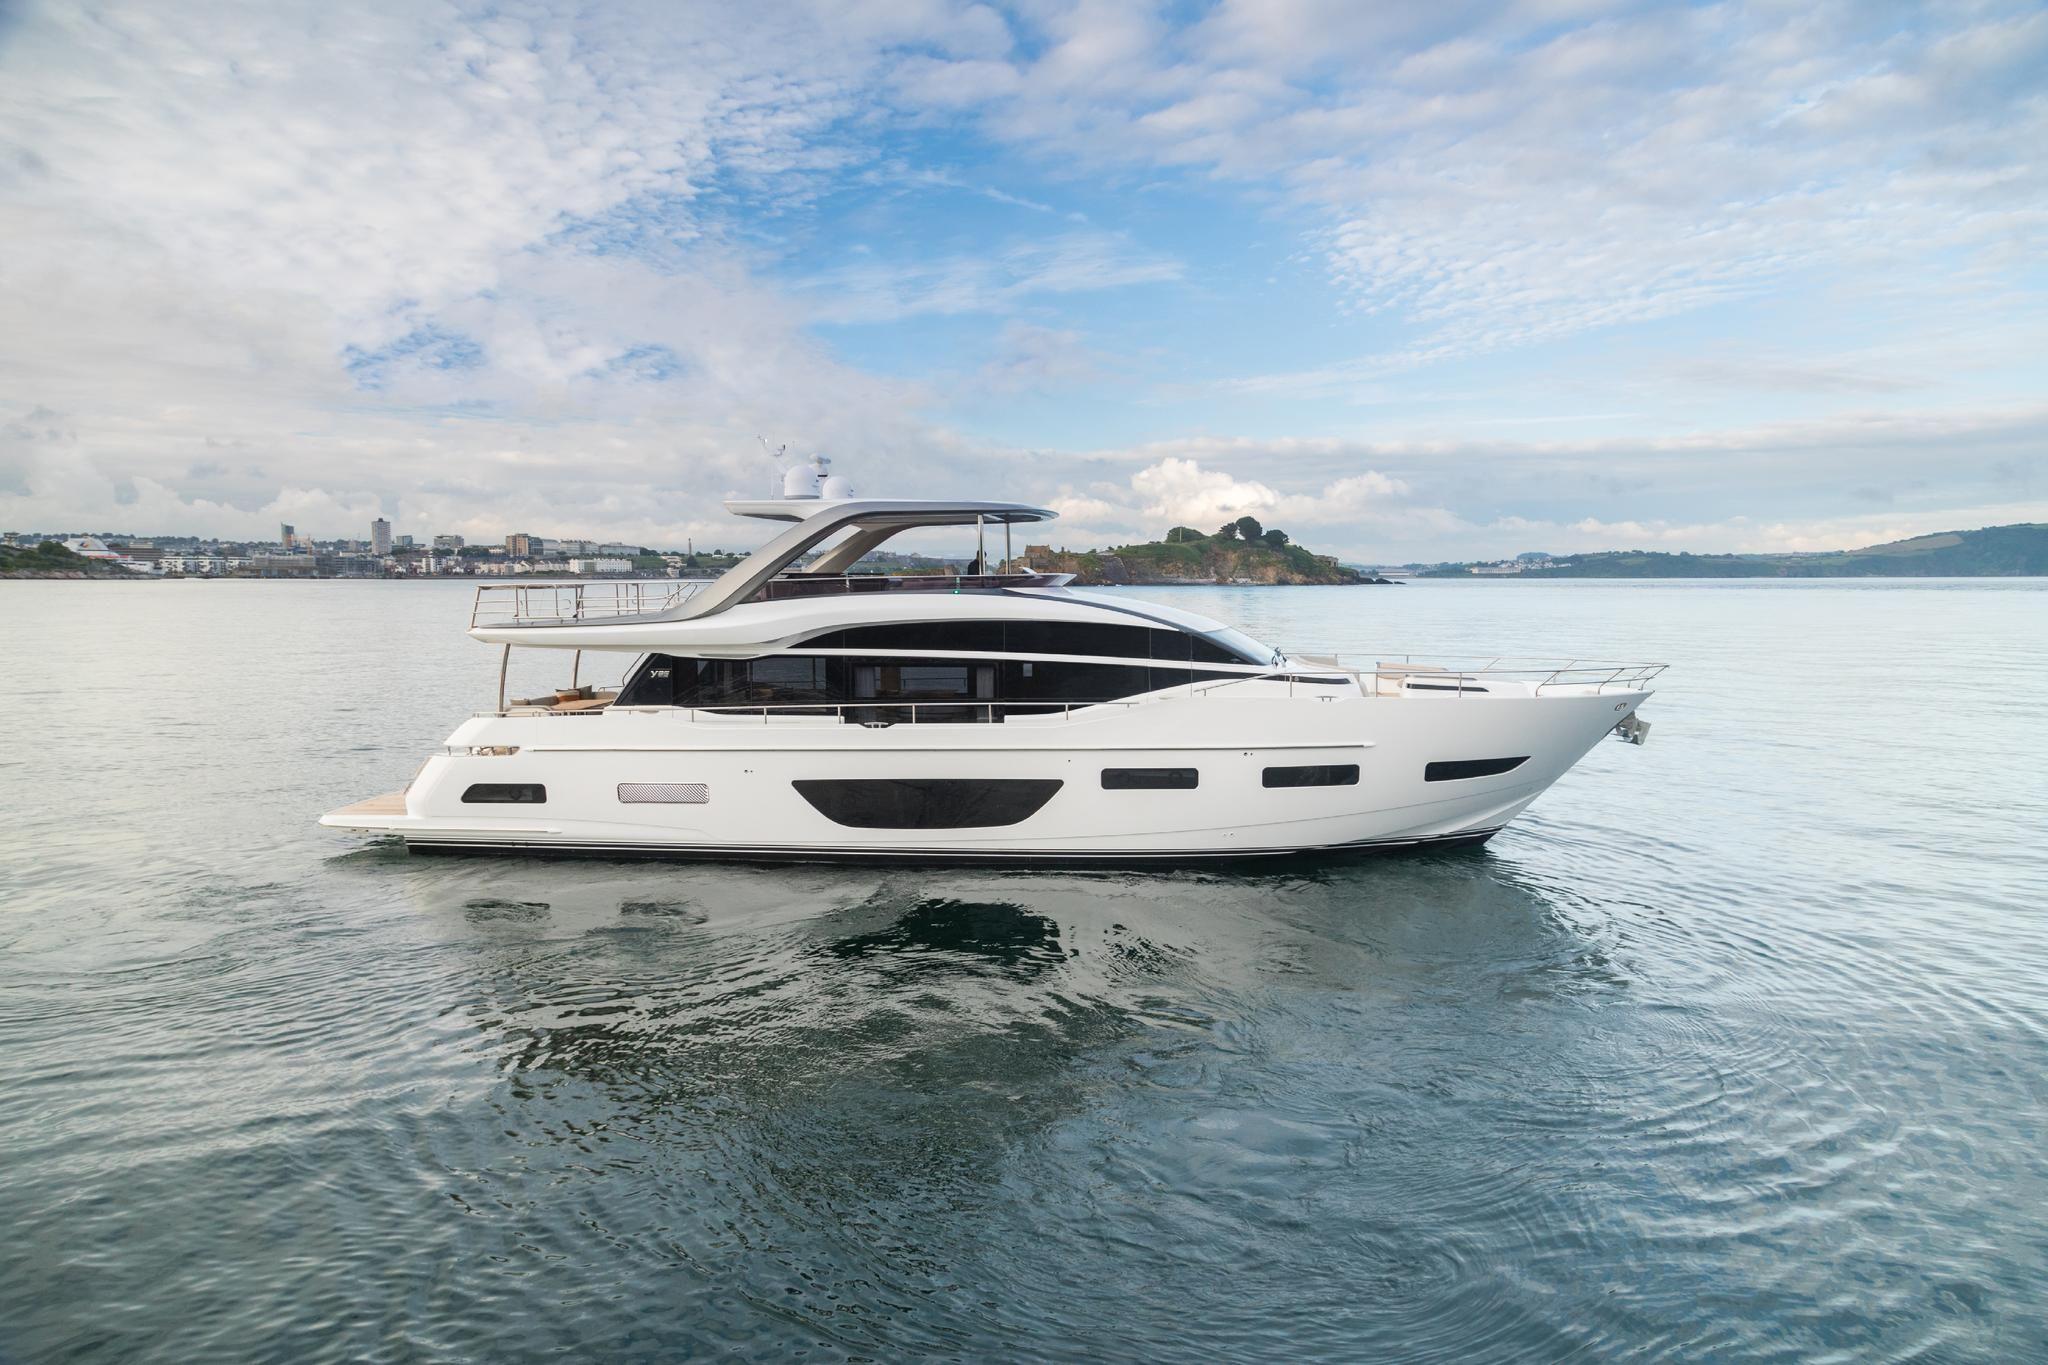 Princess Yachts Limited